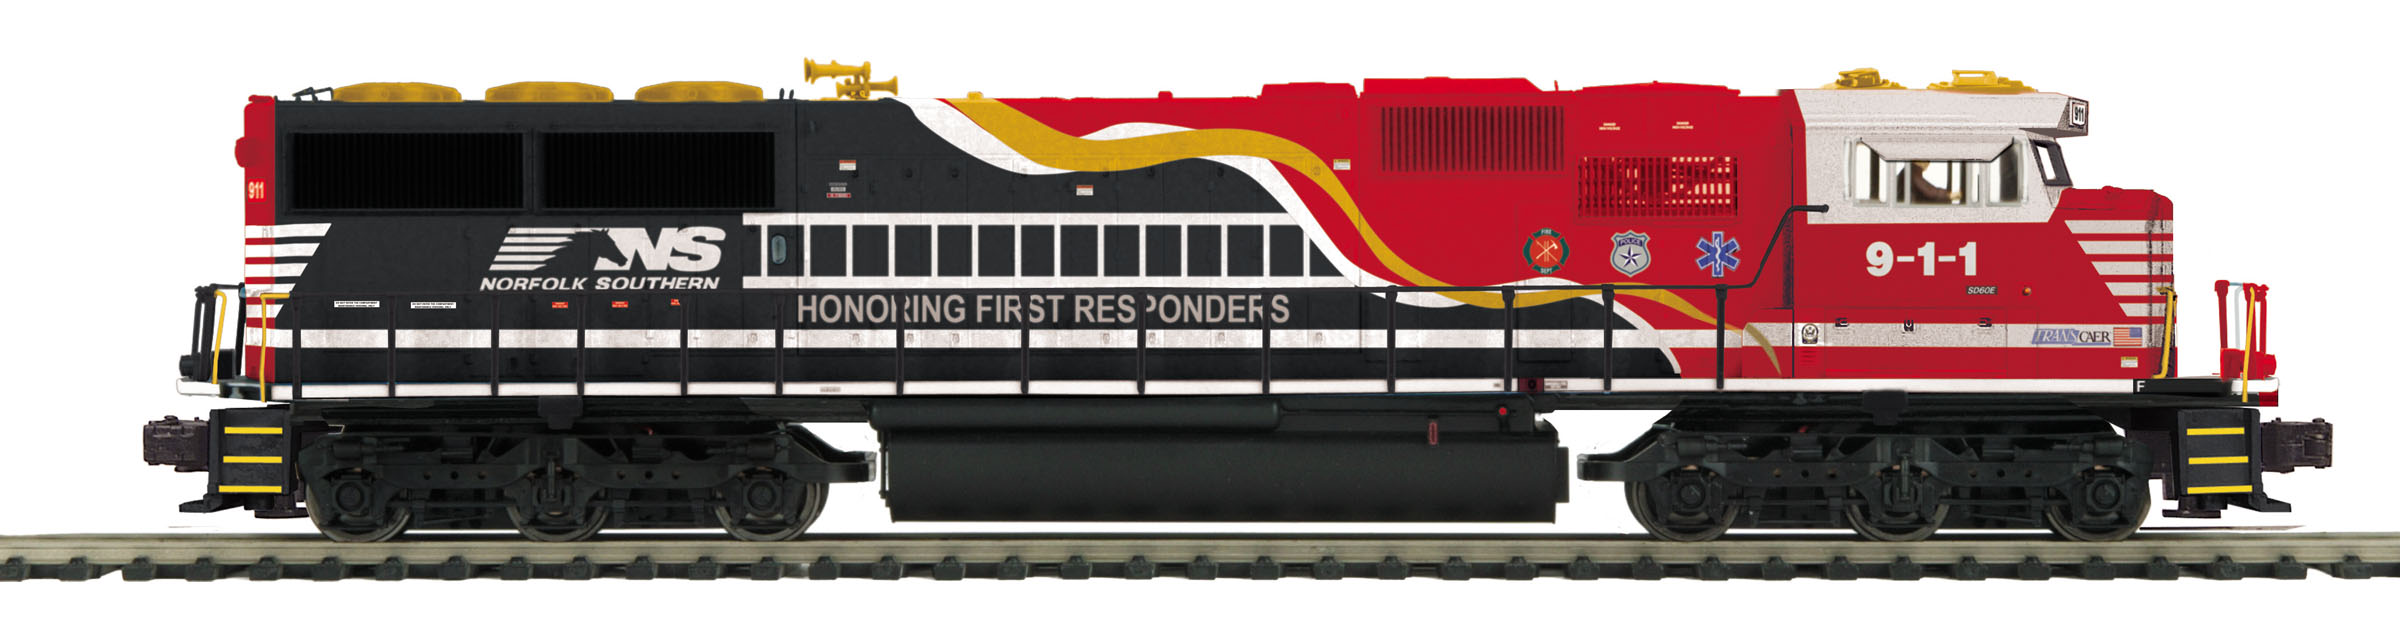 NS911